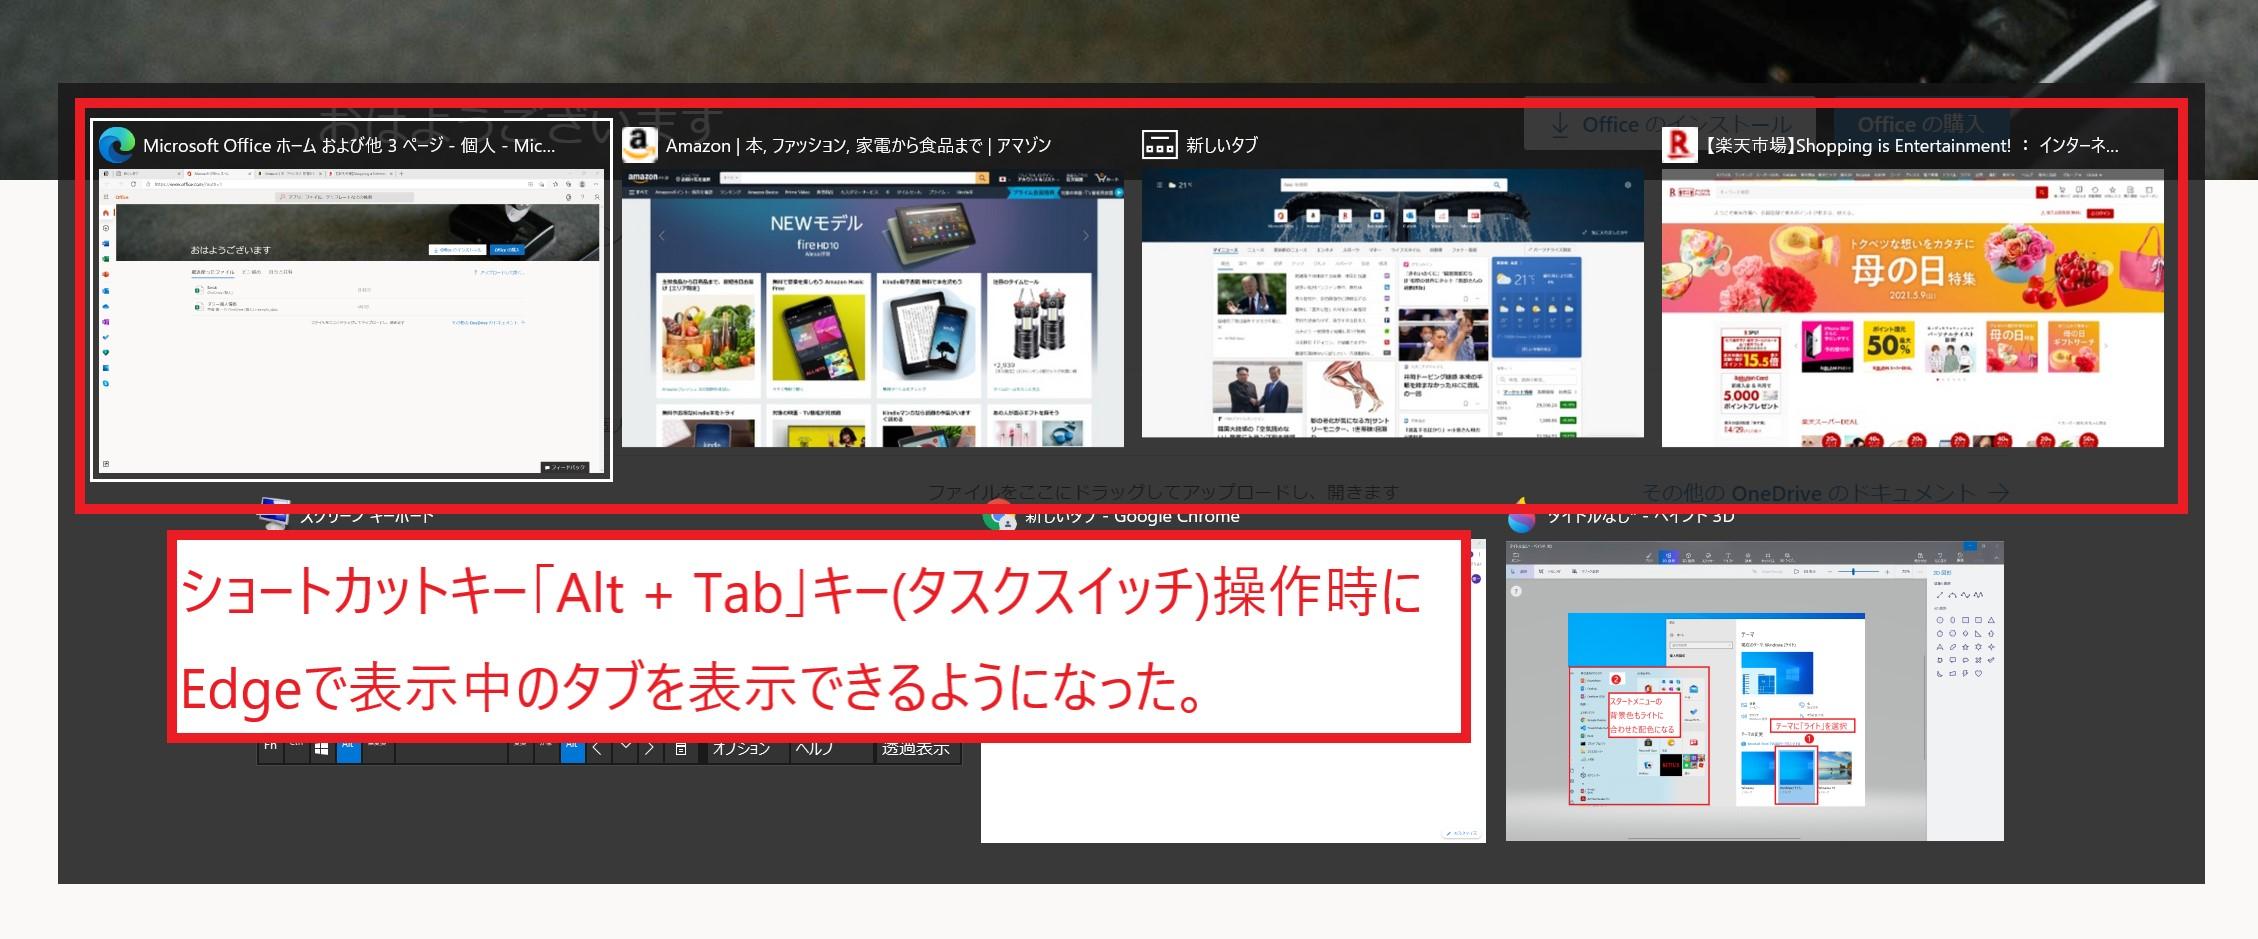 Windows10 20H2の新機能